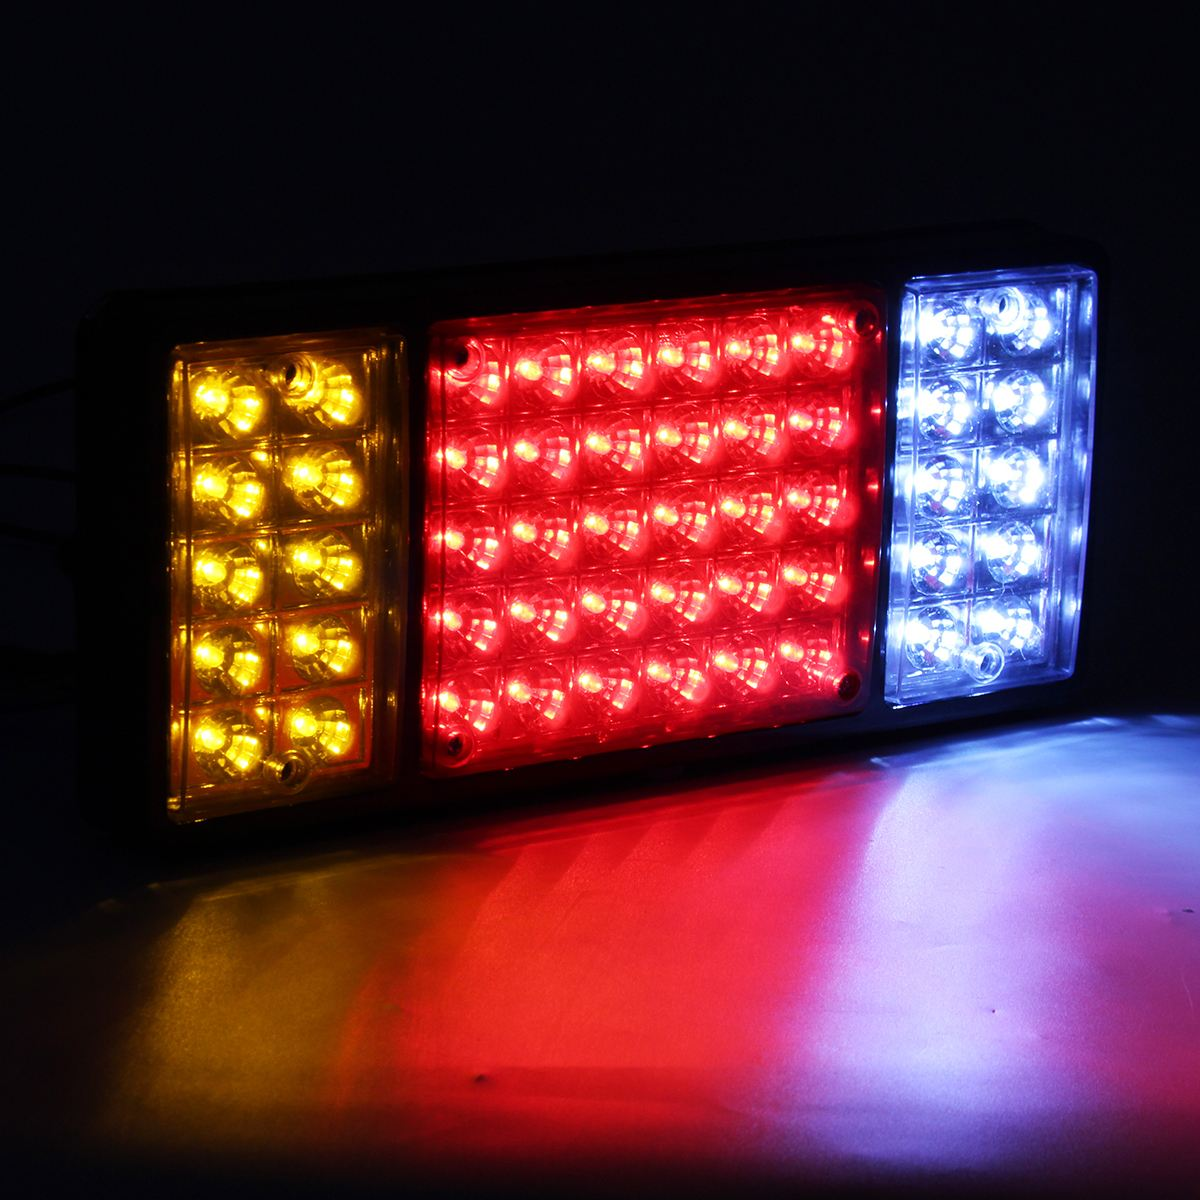 1Pair 12V LED Car Rear Tail Lights Reverse Lamp For Trailer Caravan Truck Lorry Rear Reverse Stop Light